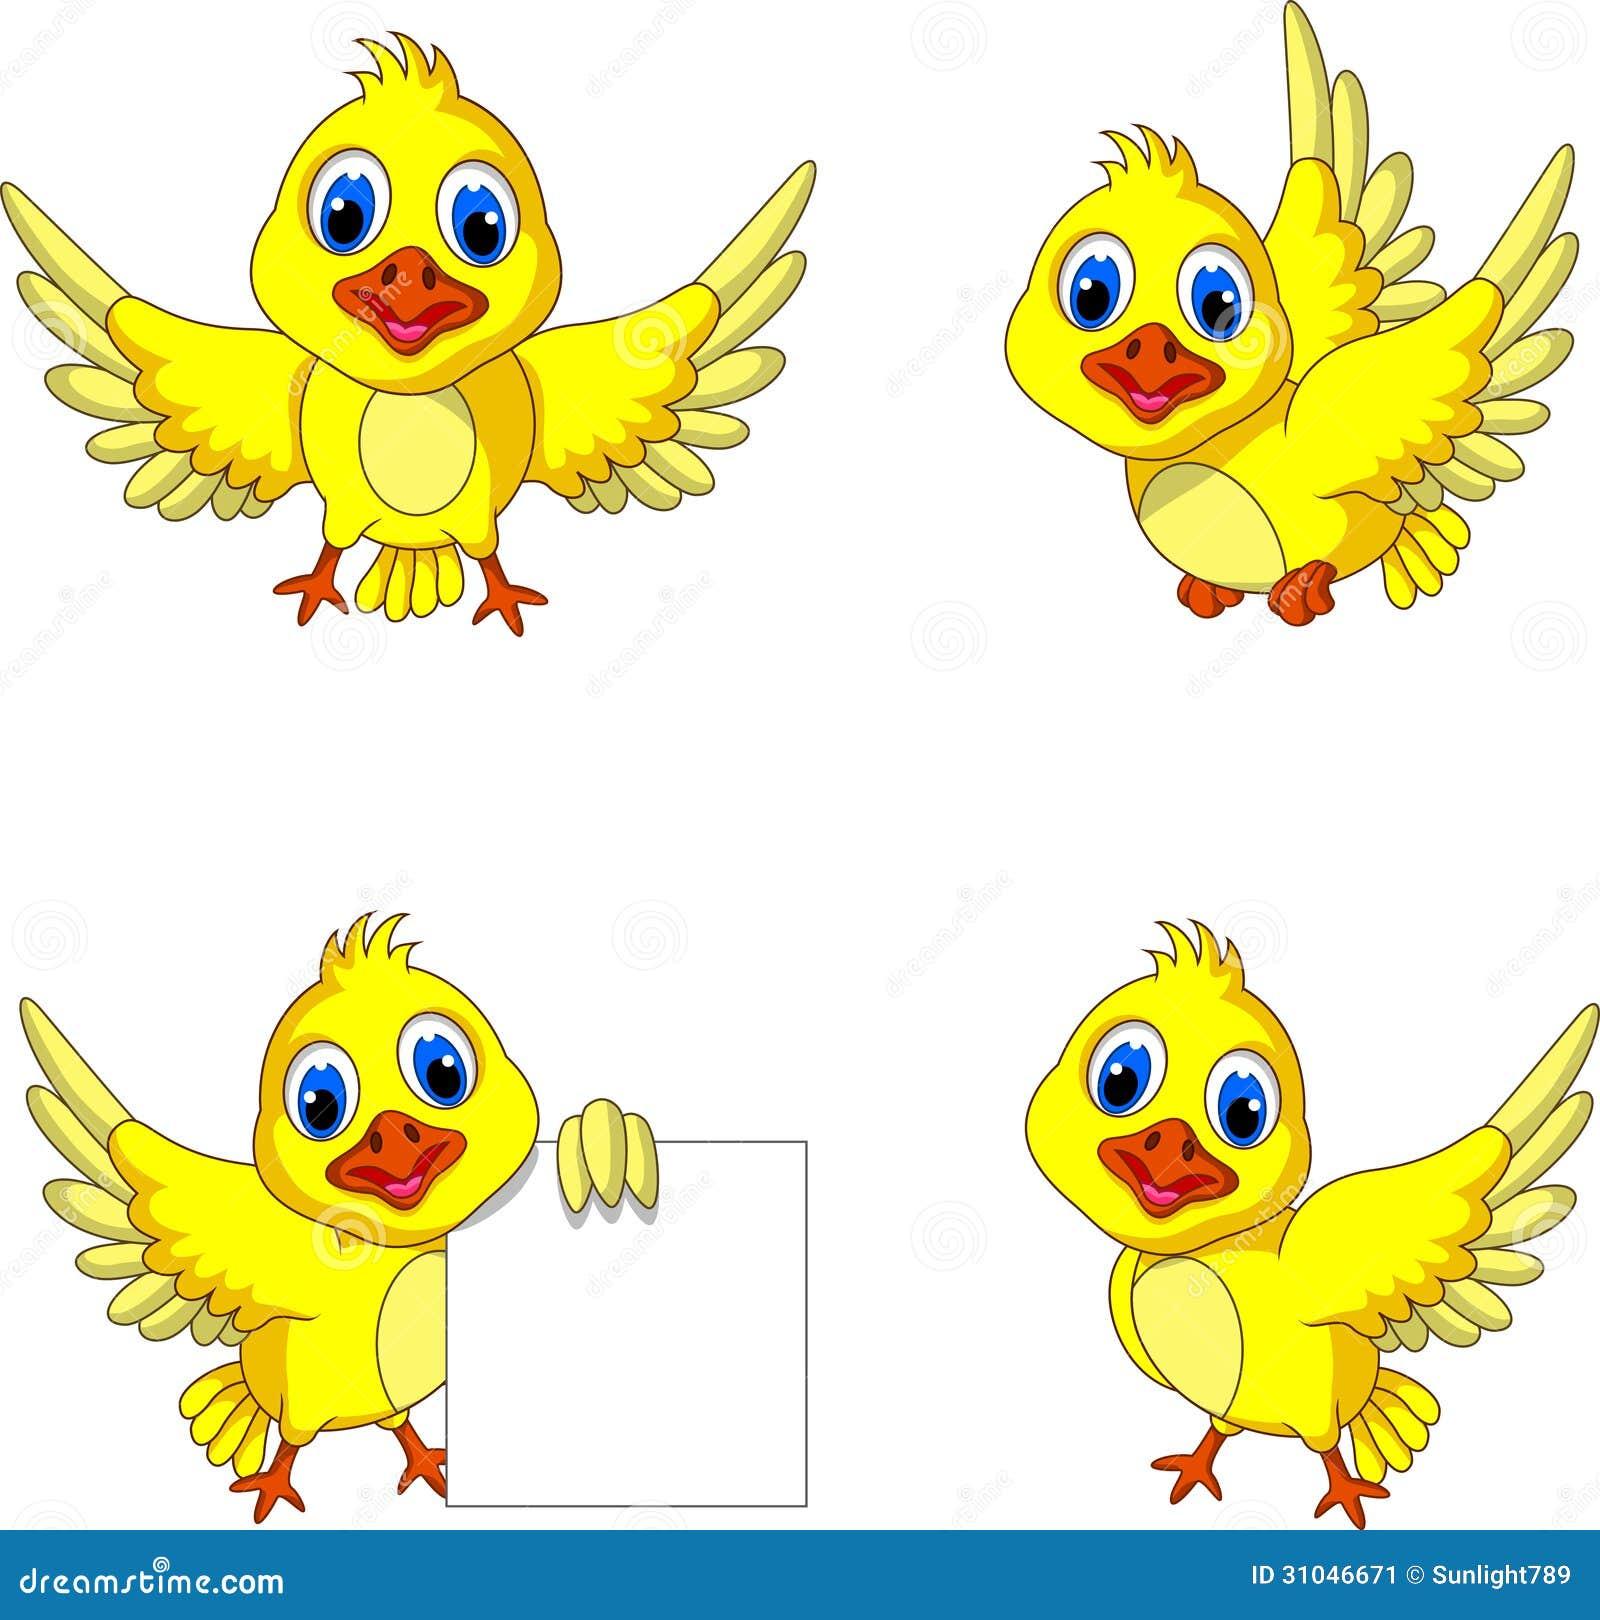 cute yellow bird cartoon collection stock image image 31046671